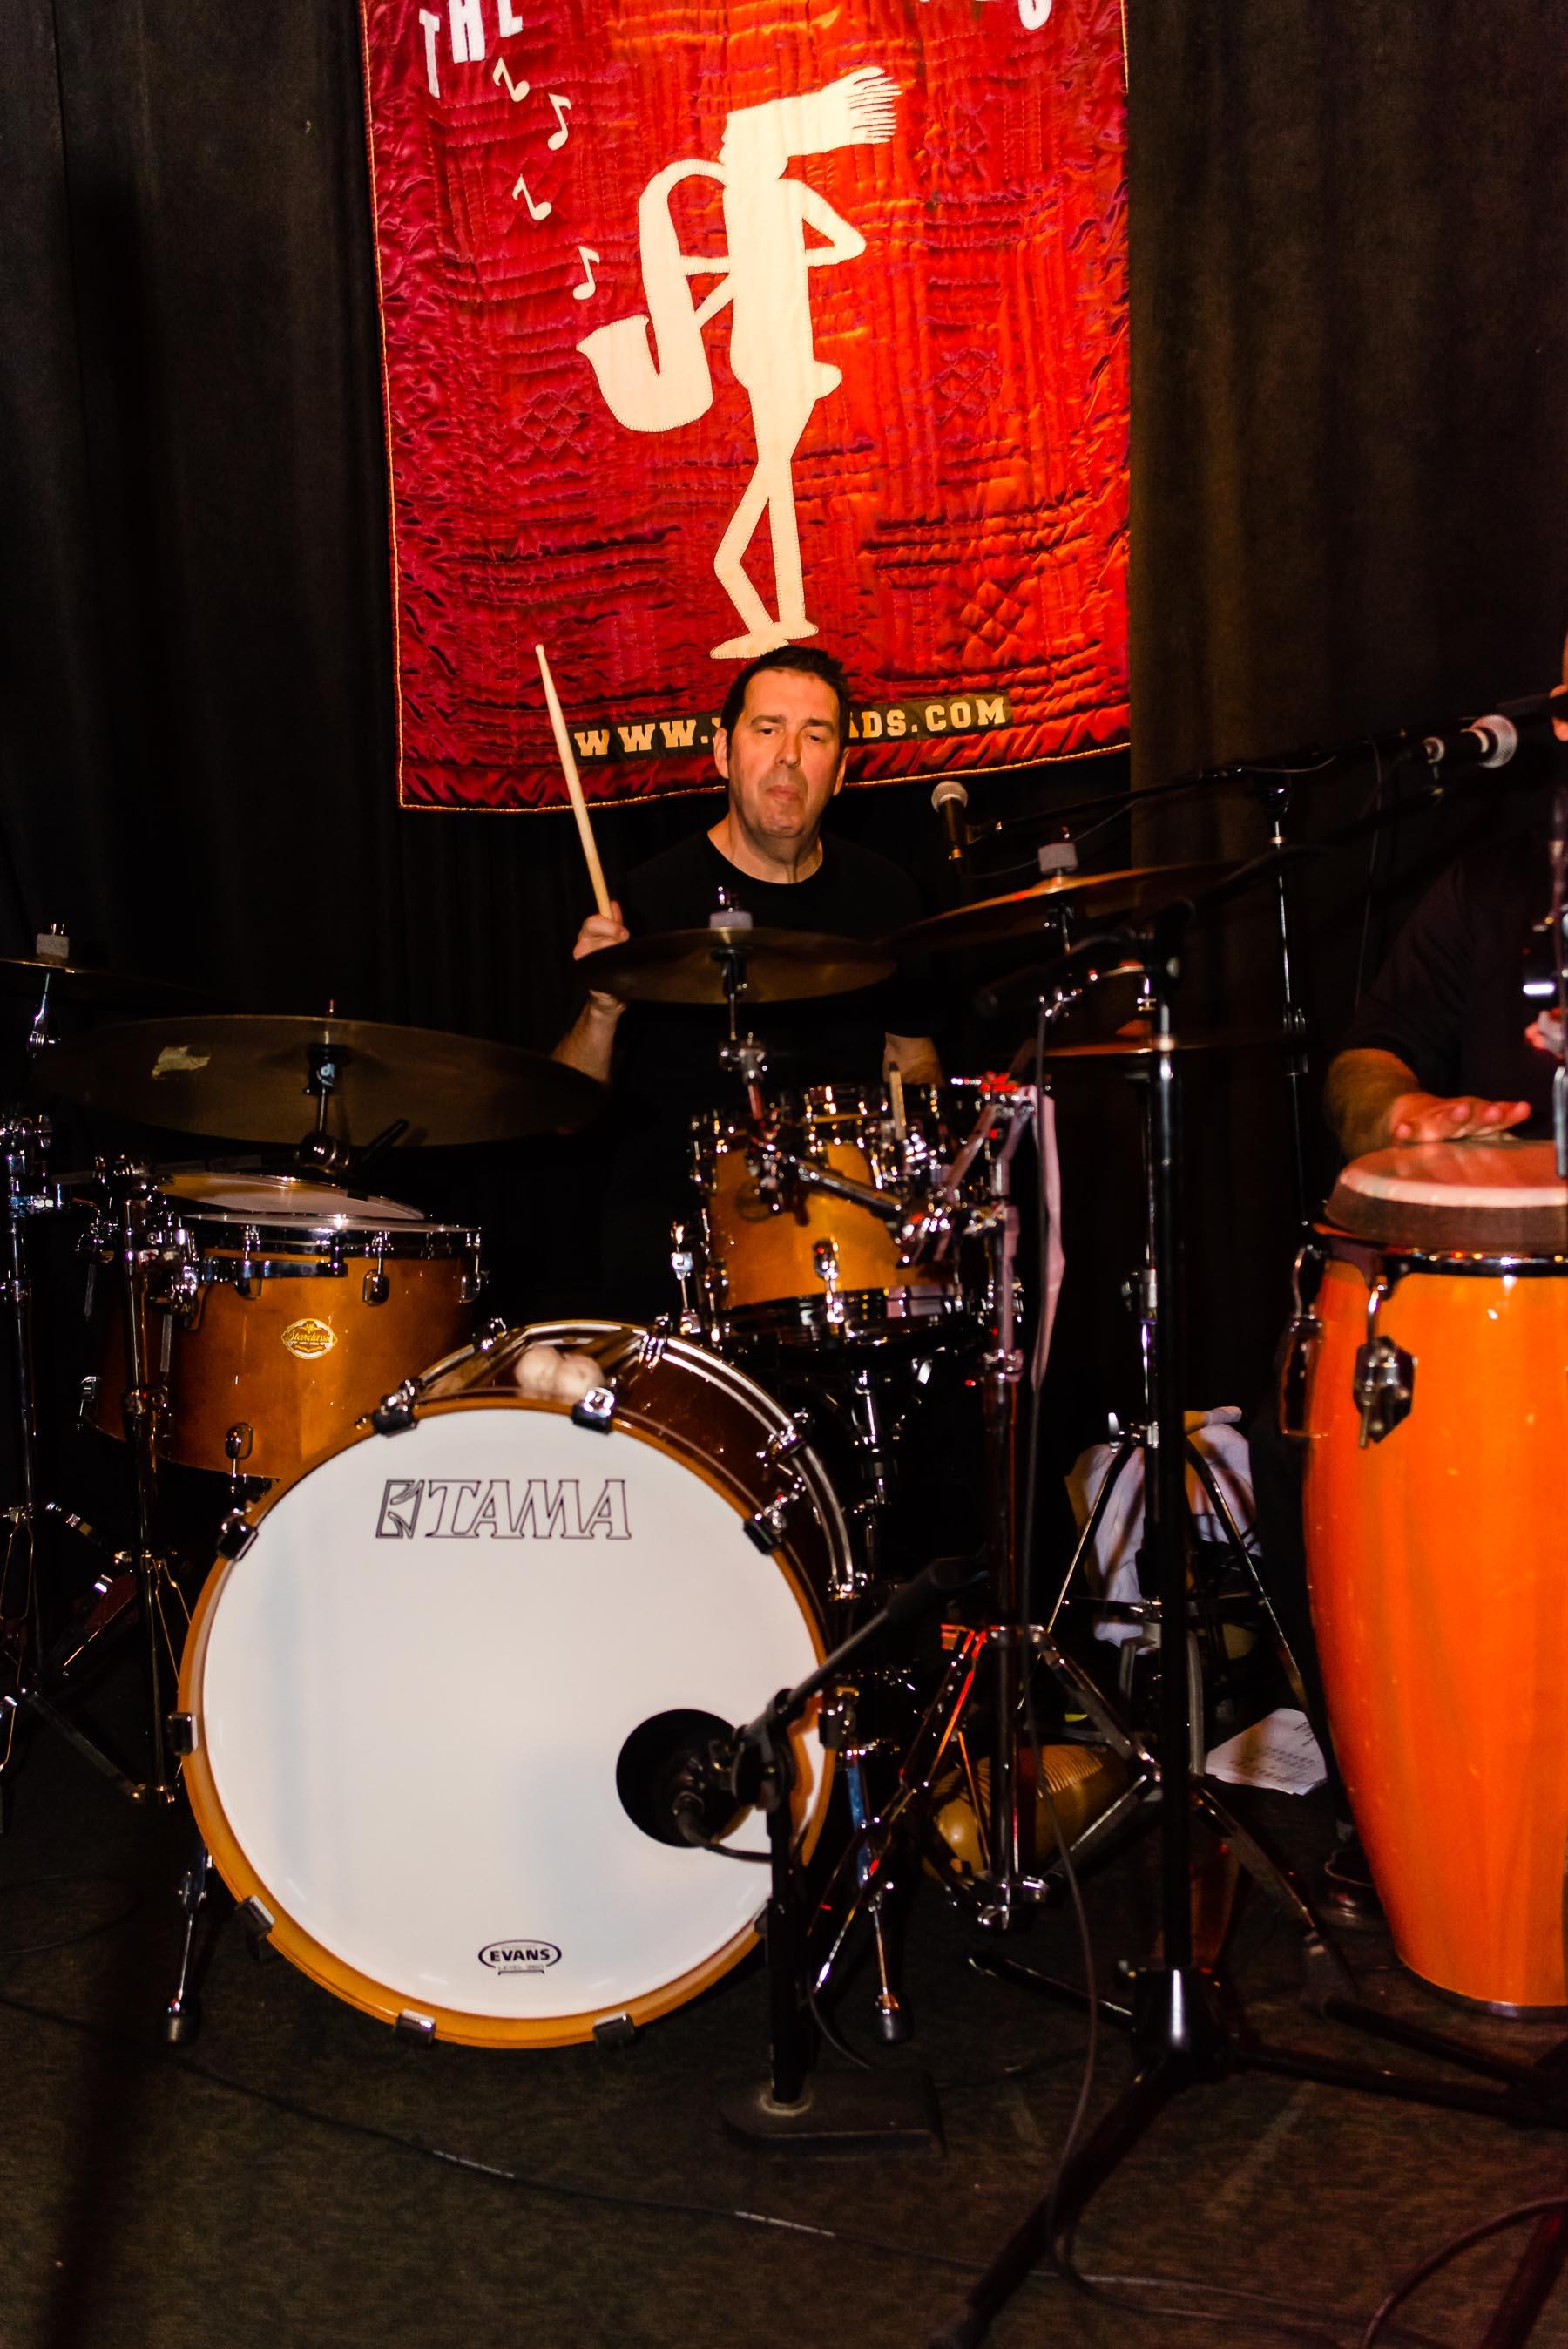 Travis Hudelson of Equinox / 11/14/15 / Crossroads / Garwood, NJ